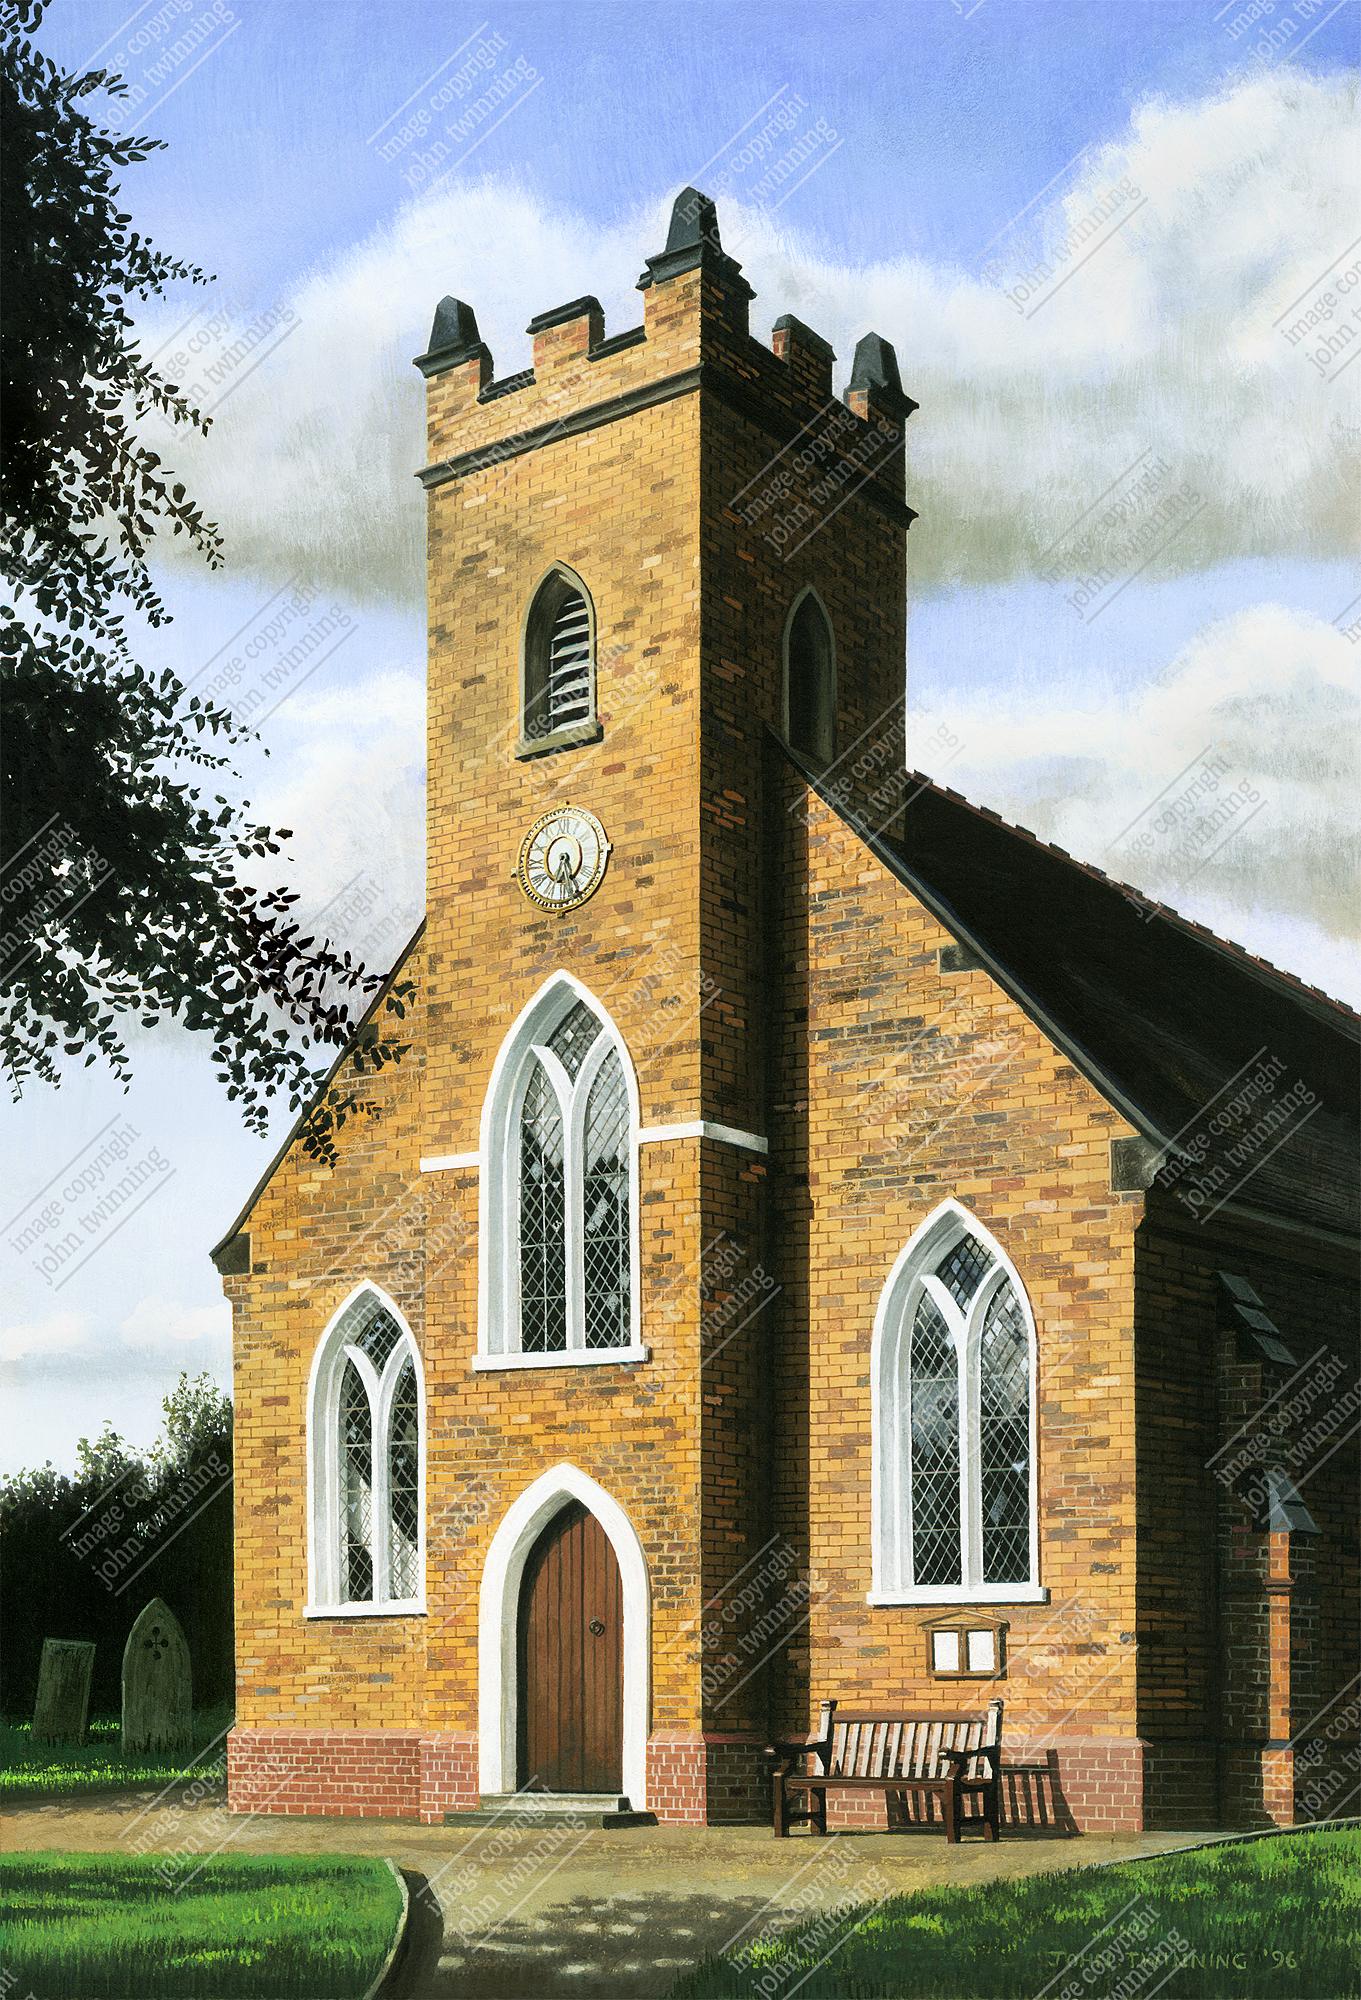 St. Peter's parish church, Stonnall